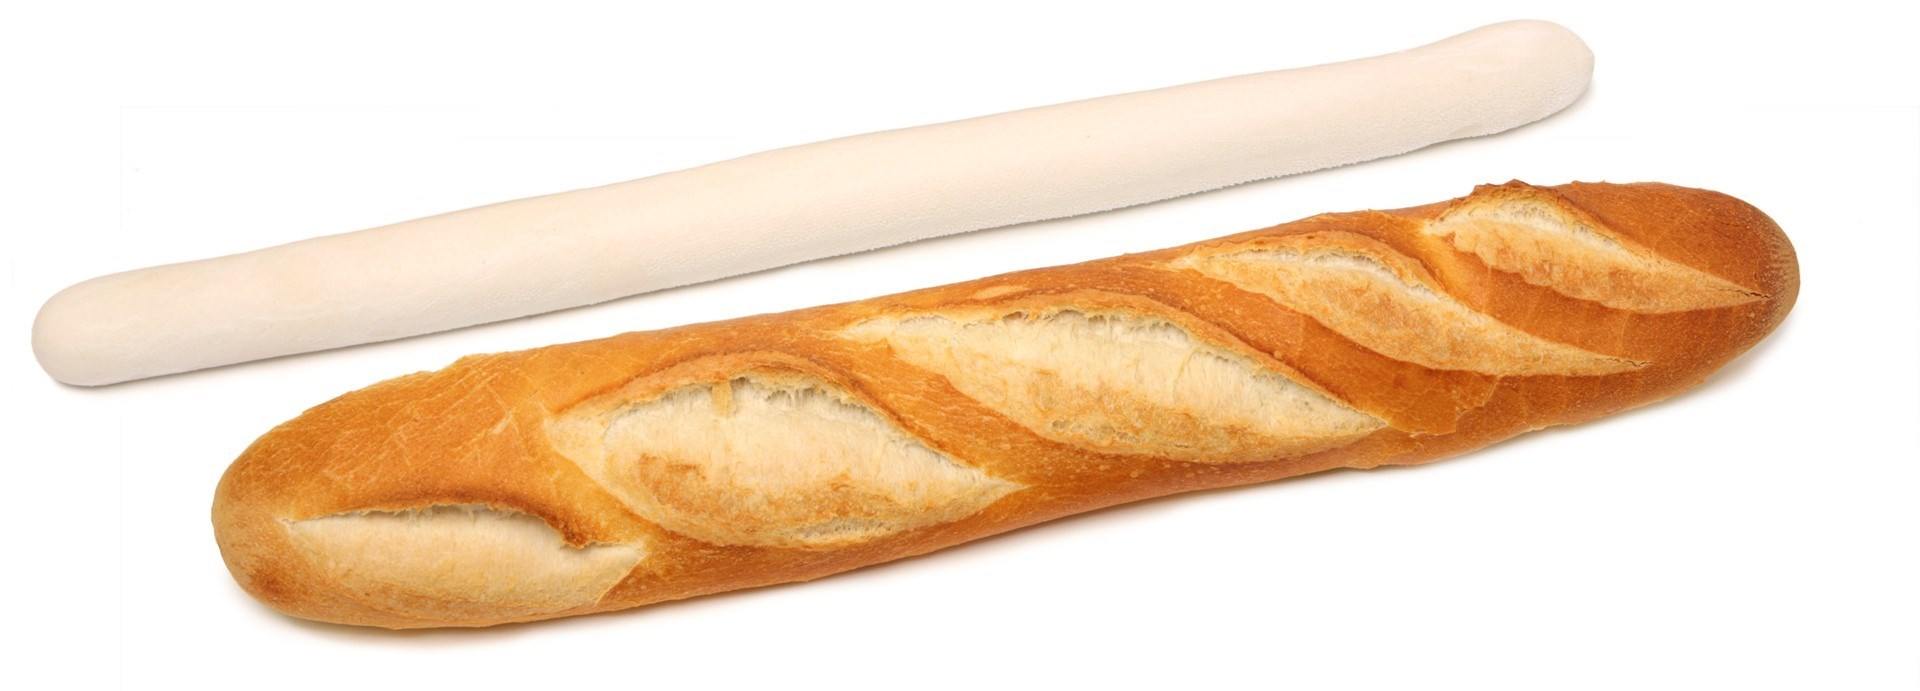 Productafbeelding I881 Cru baguette wit 330g